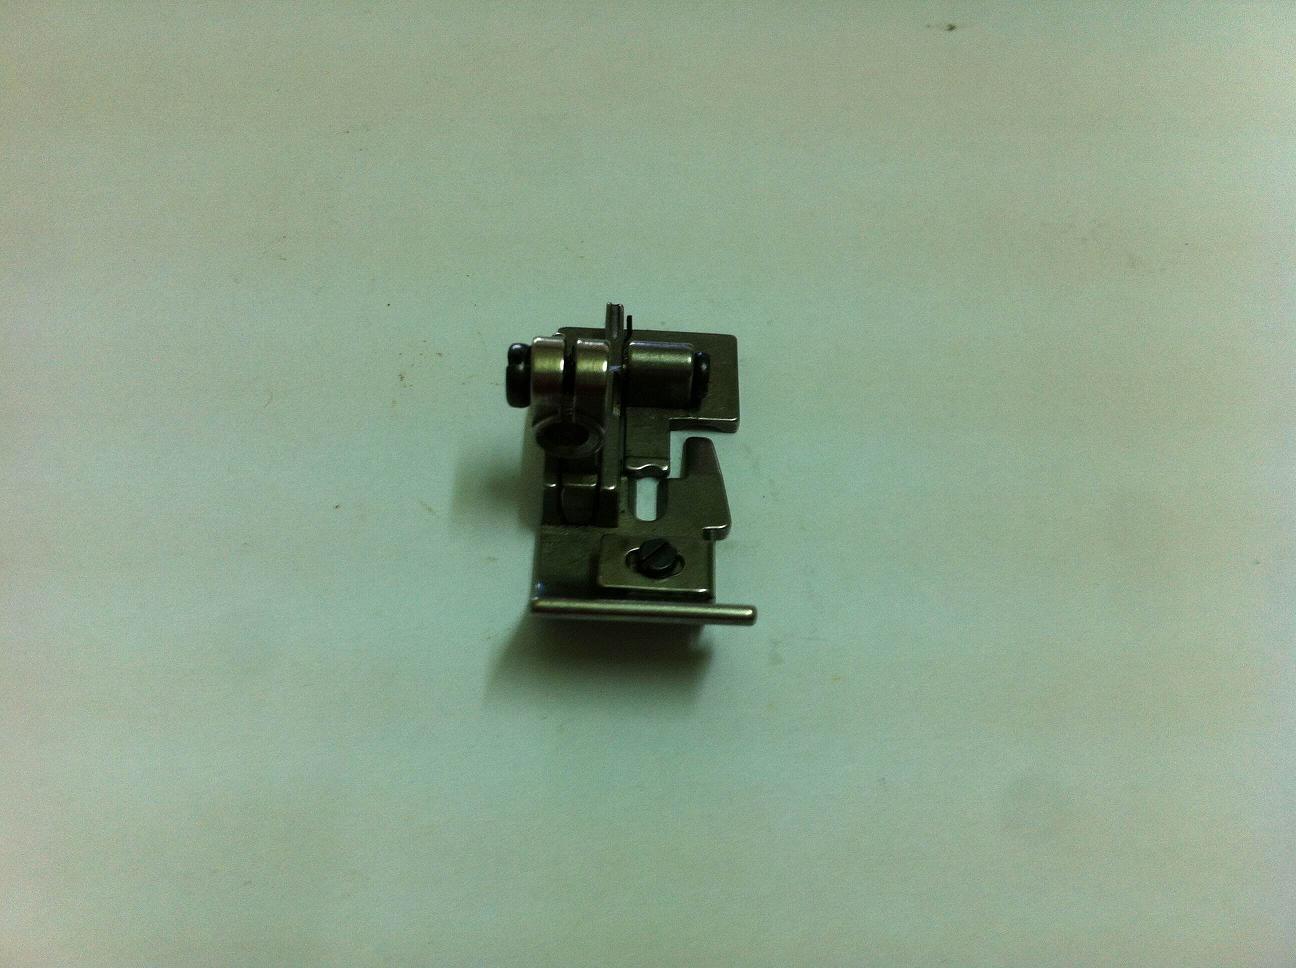 Chân vịt vắt sổ PEGASUS M700-5-L32-48